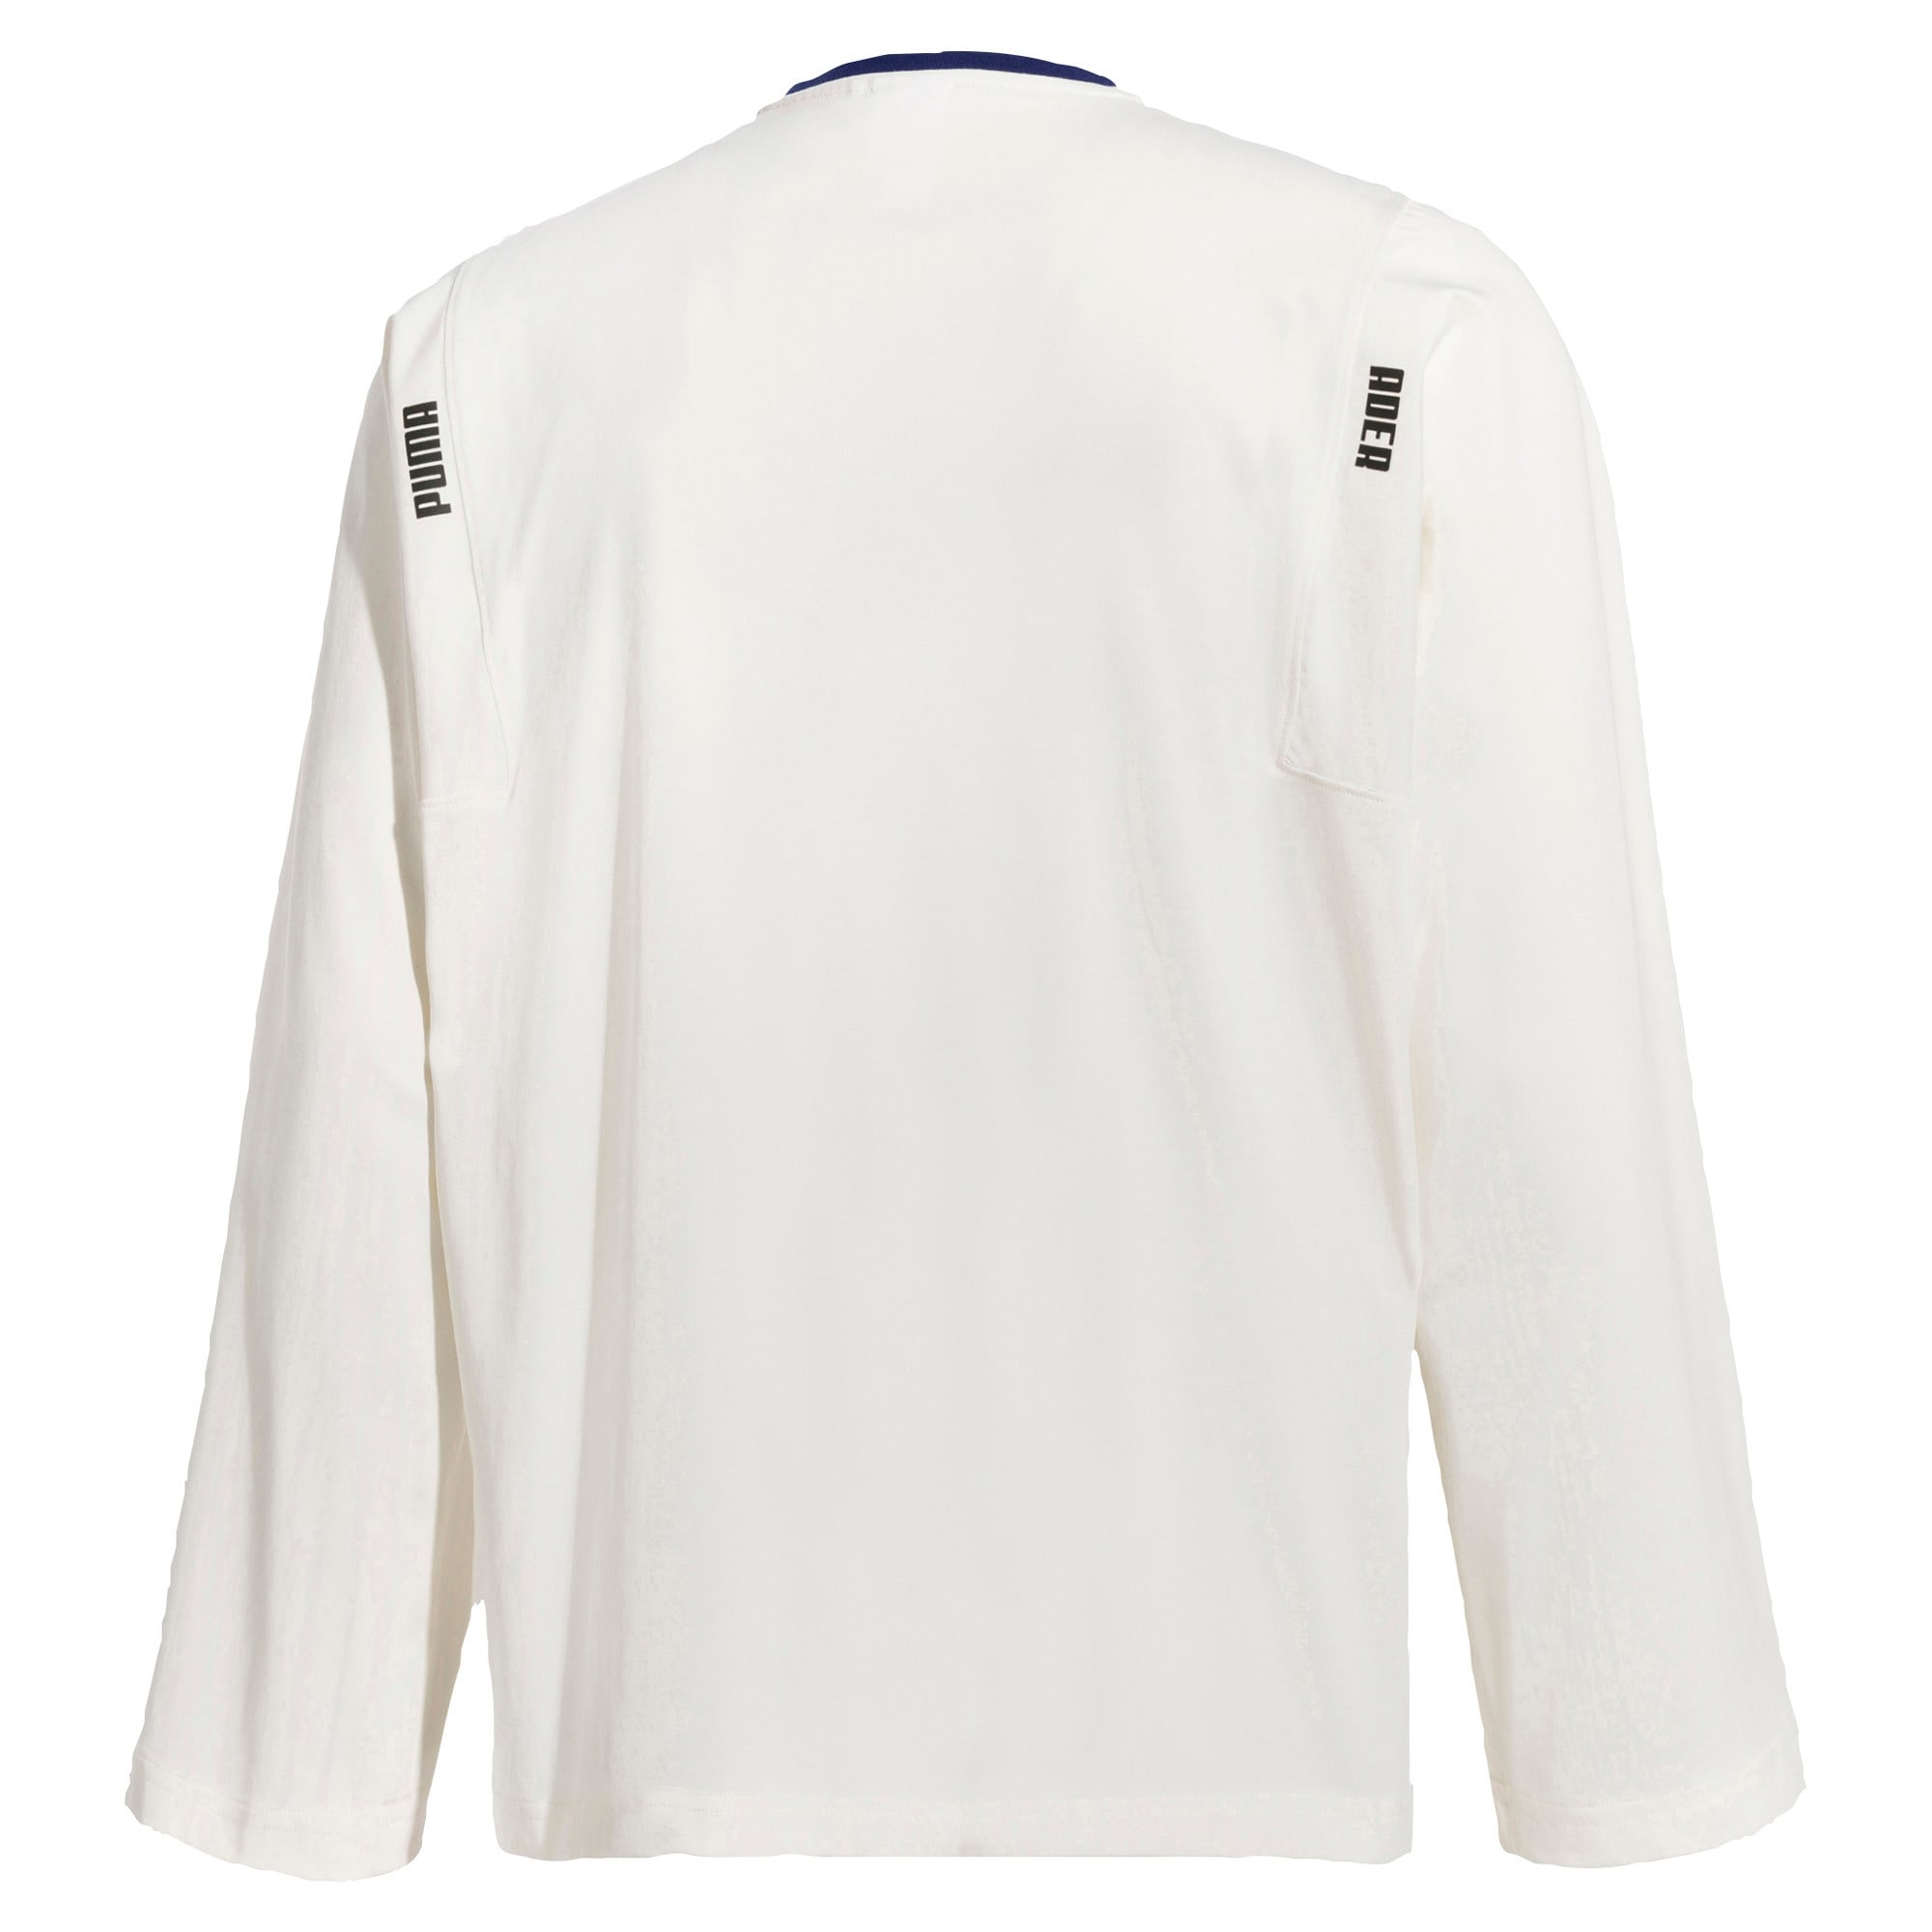 Thumbnail 4 of PUMA x ADER ERROR Langarm-Shirt, Whisper White, medium